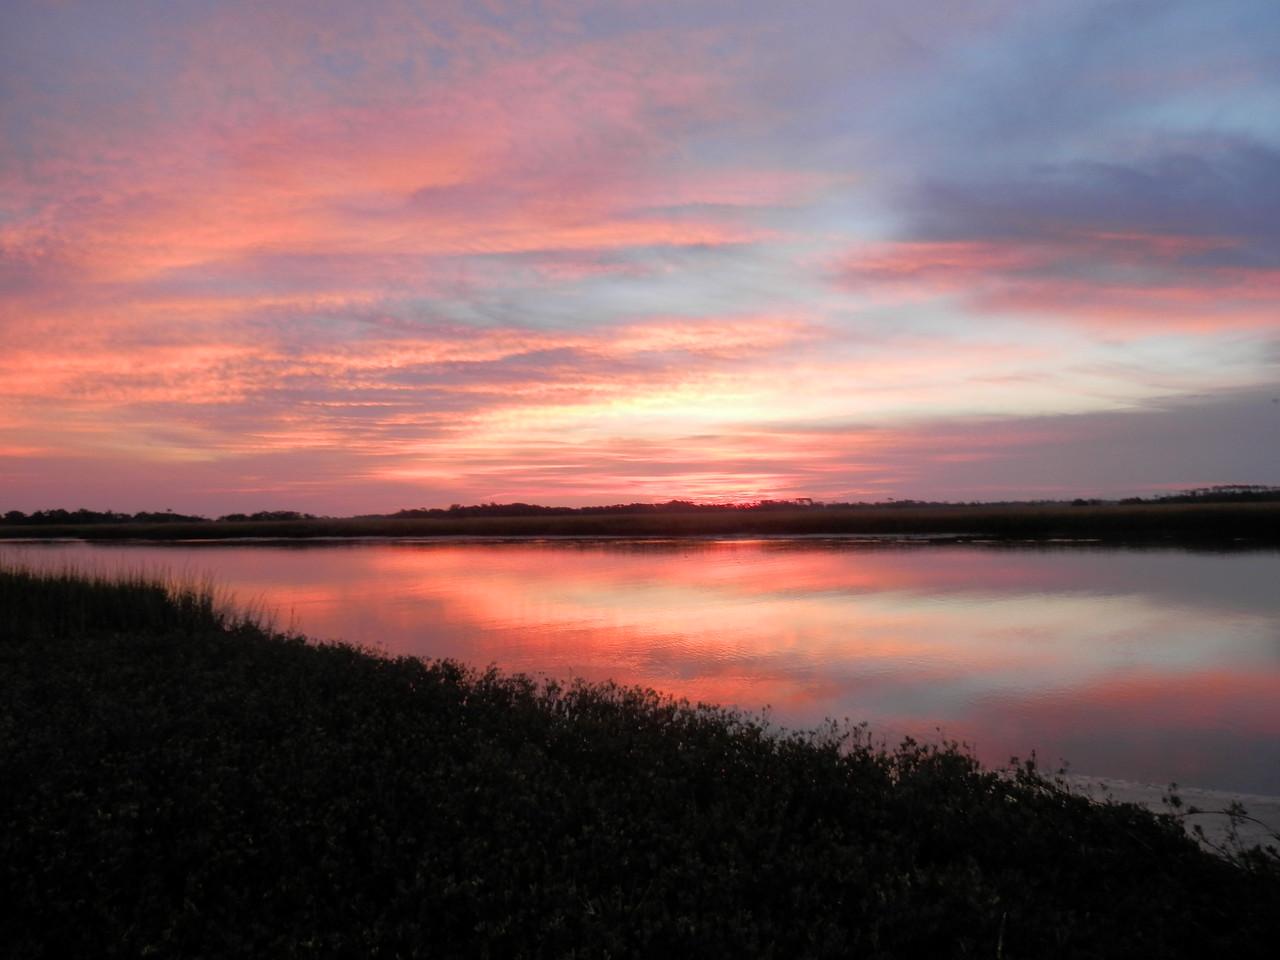 Photo was taken at Day Break looking East over the Bald Head Island Creek. by Captain Beth Schwab.